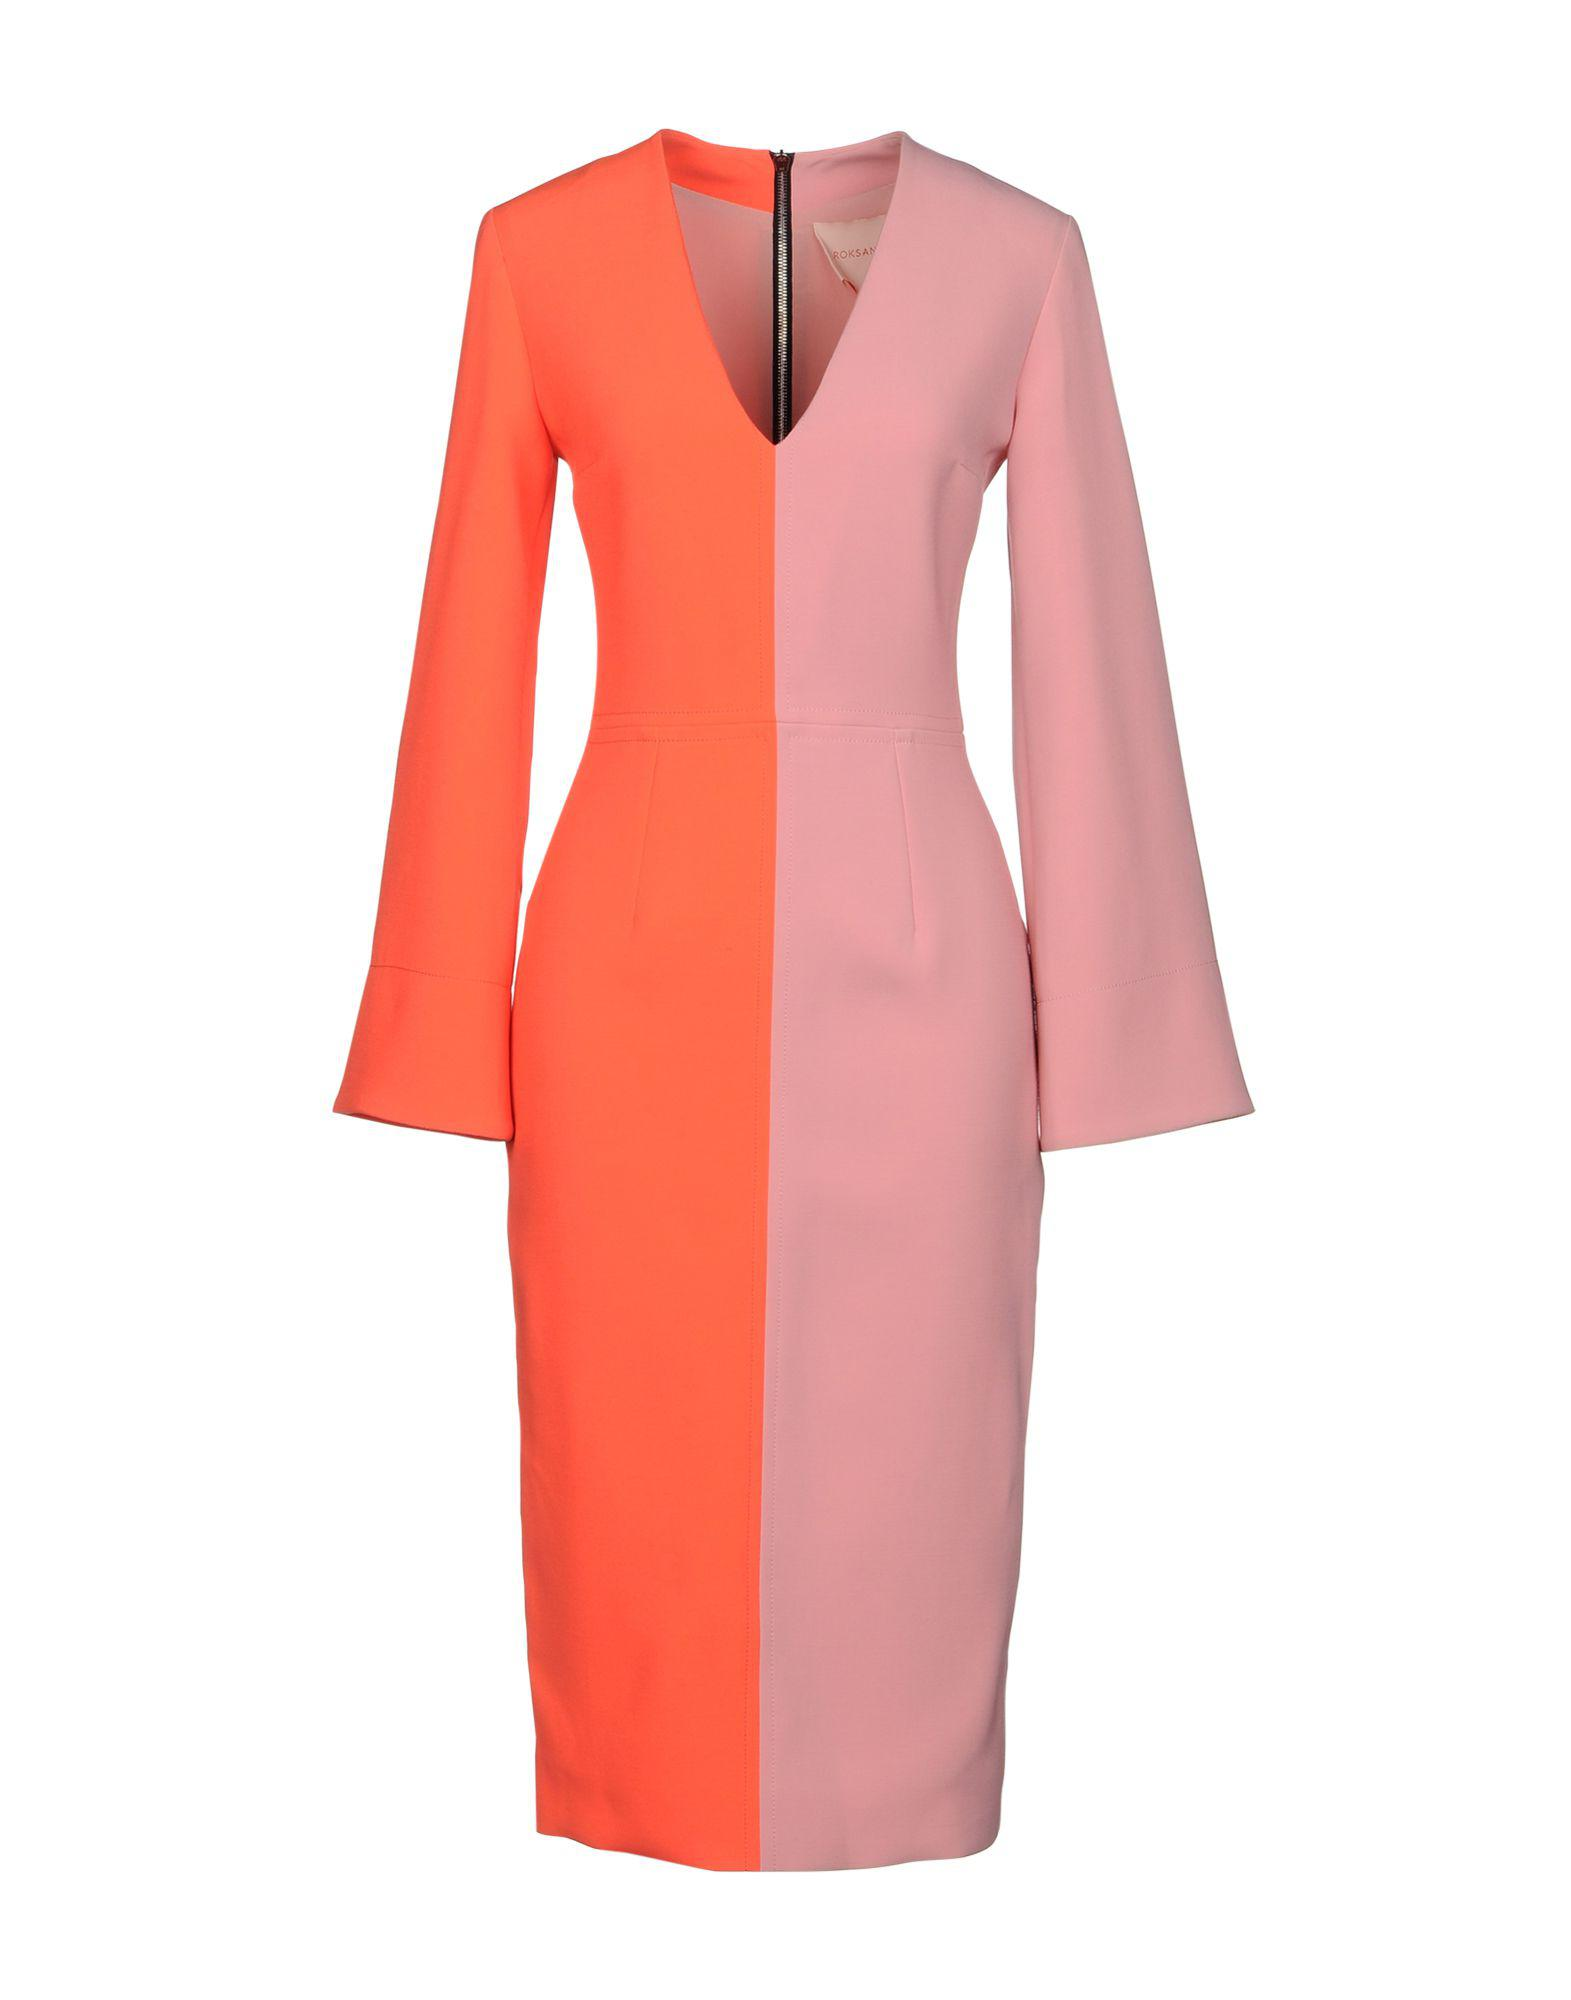 DRESSES - Knee-length dresses Roksanda Ilincic Low Price Fee Shipping aQkmyVUKB